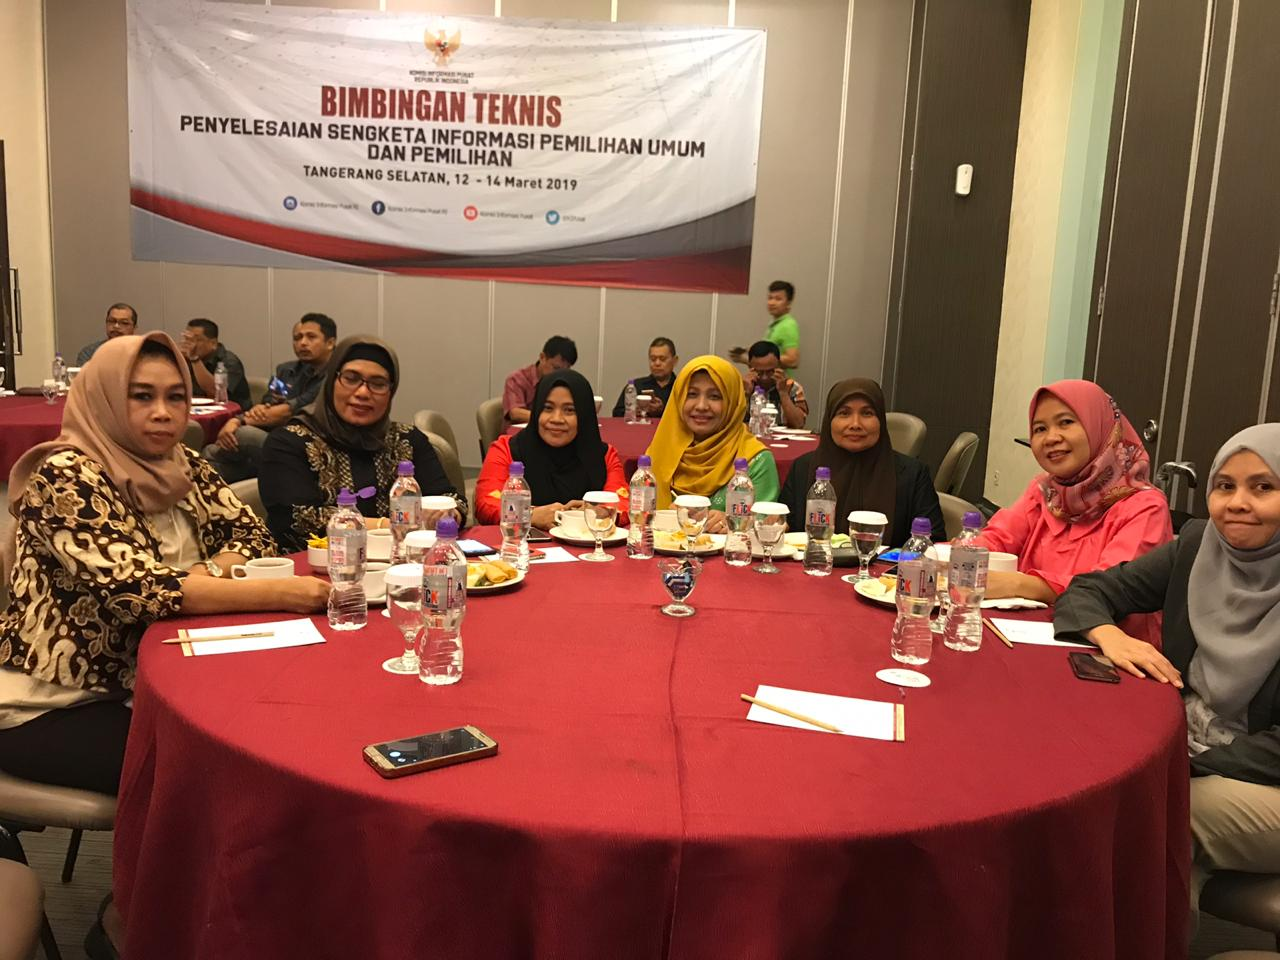 Komisi Informasi Se-Indonesia Siap Kawal Transparansi Pemilu 2019